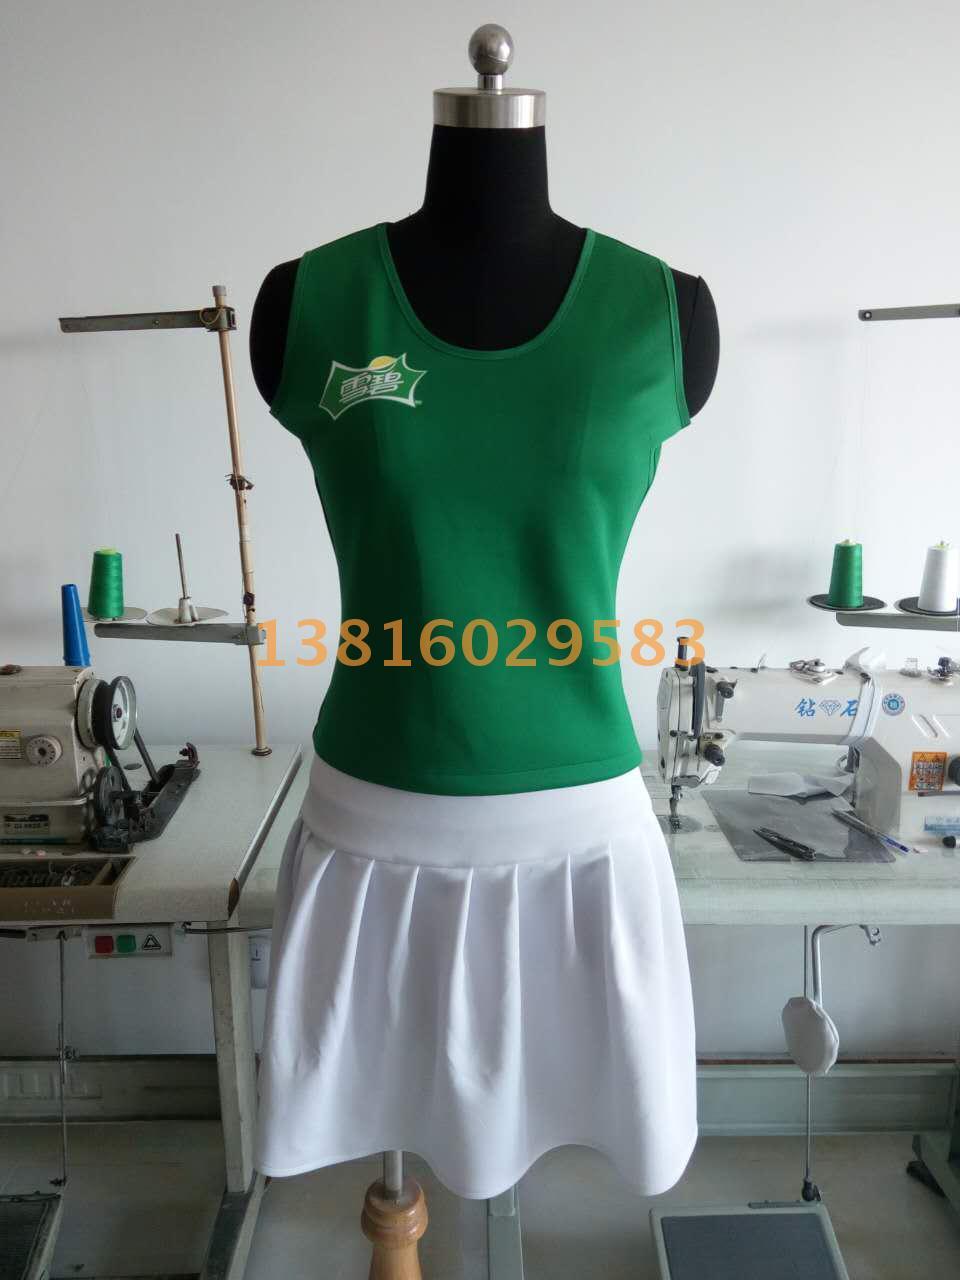 Advanced custom wine promotion clothes work clothes salesman uniform promotion clothes work clothes bath shop clothing order